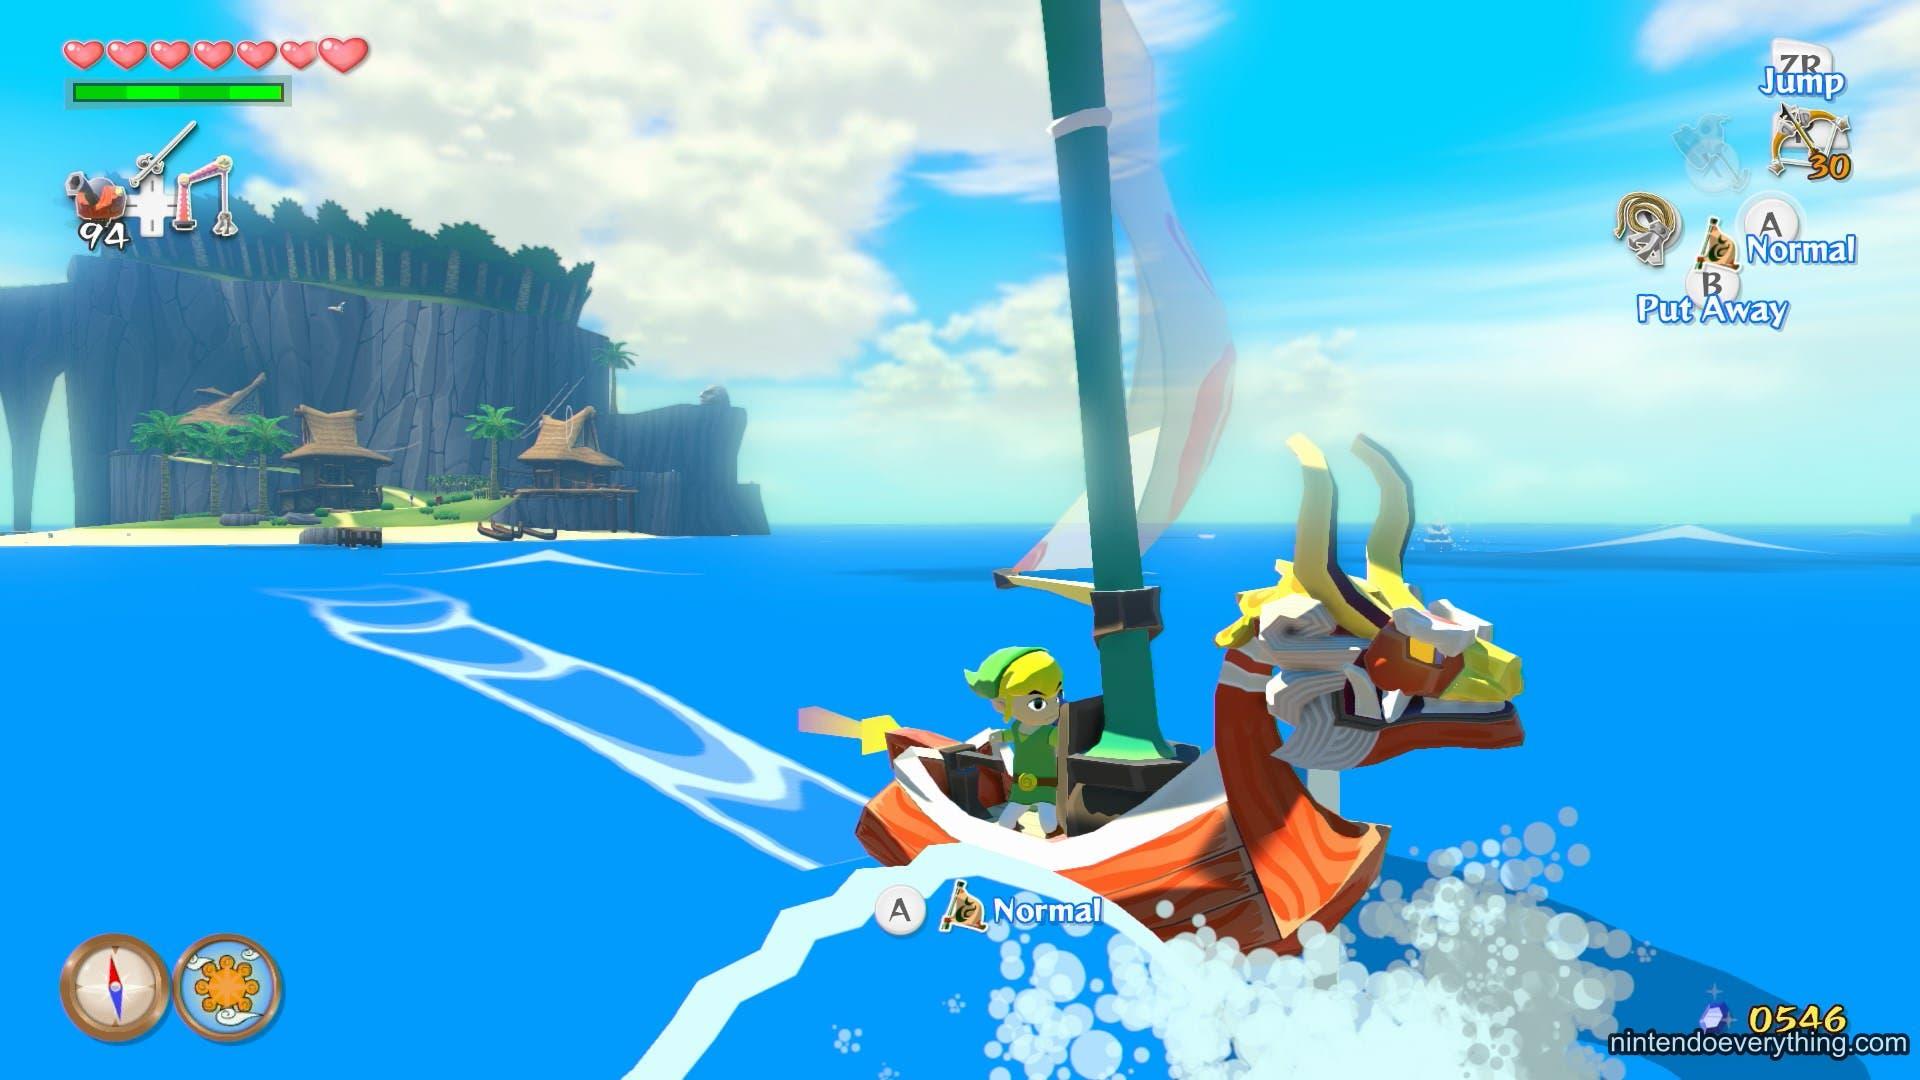 Nintendo World celebra el lanzamiento de 'The Legend of Zelda: Wind Waker HD'